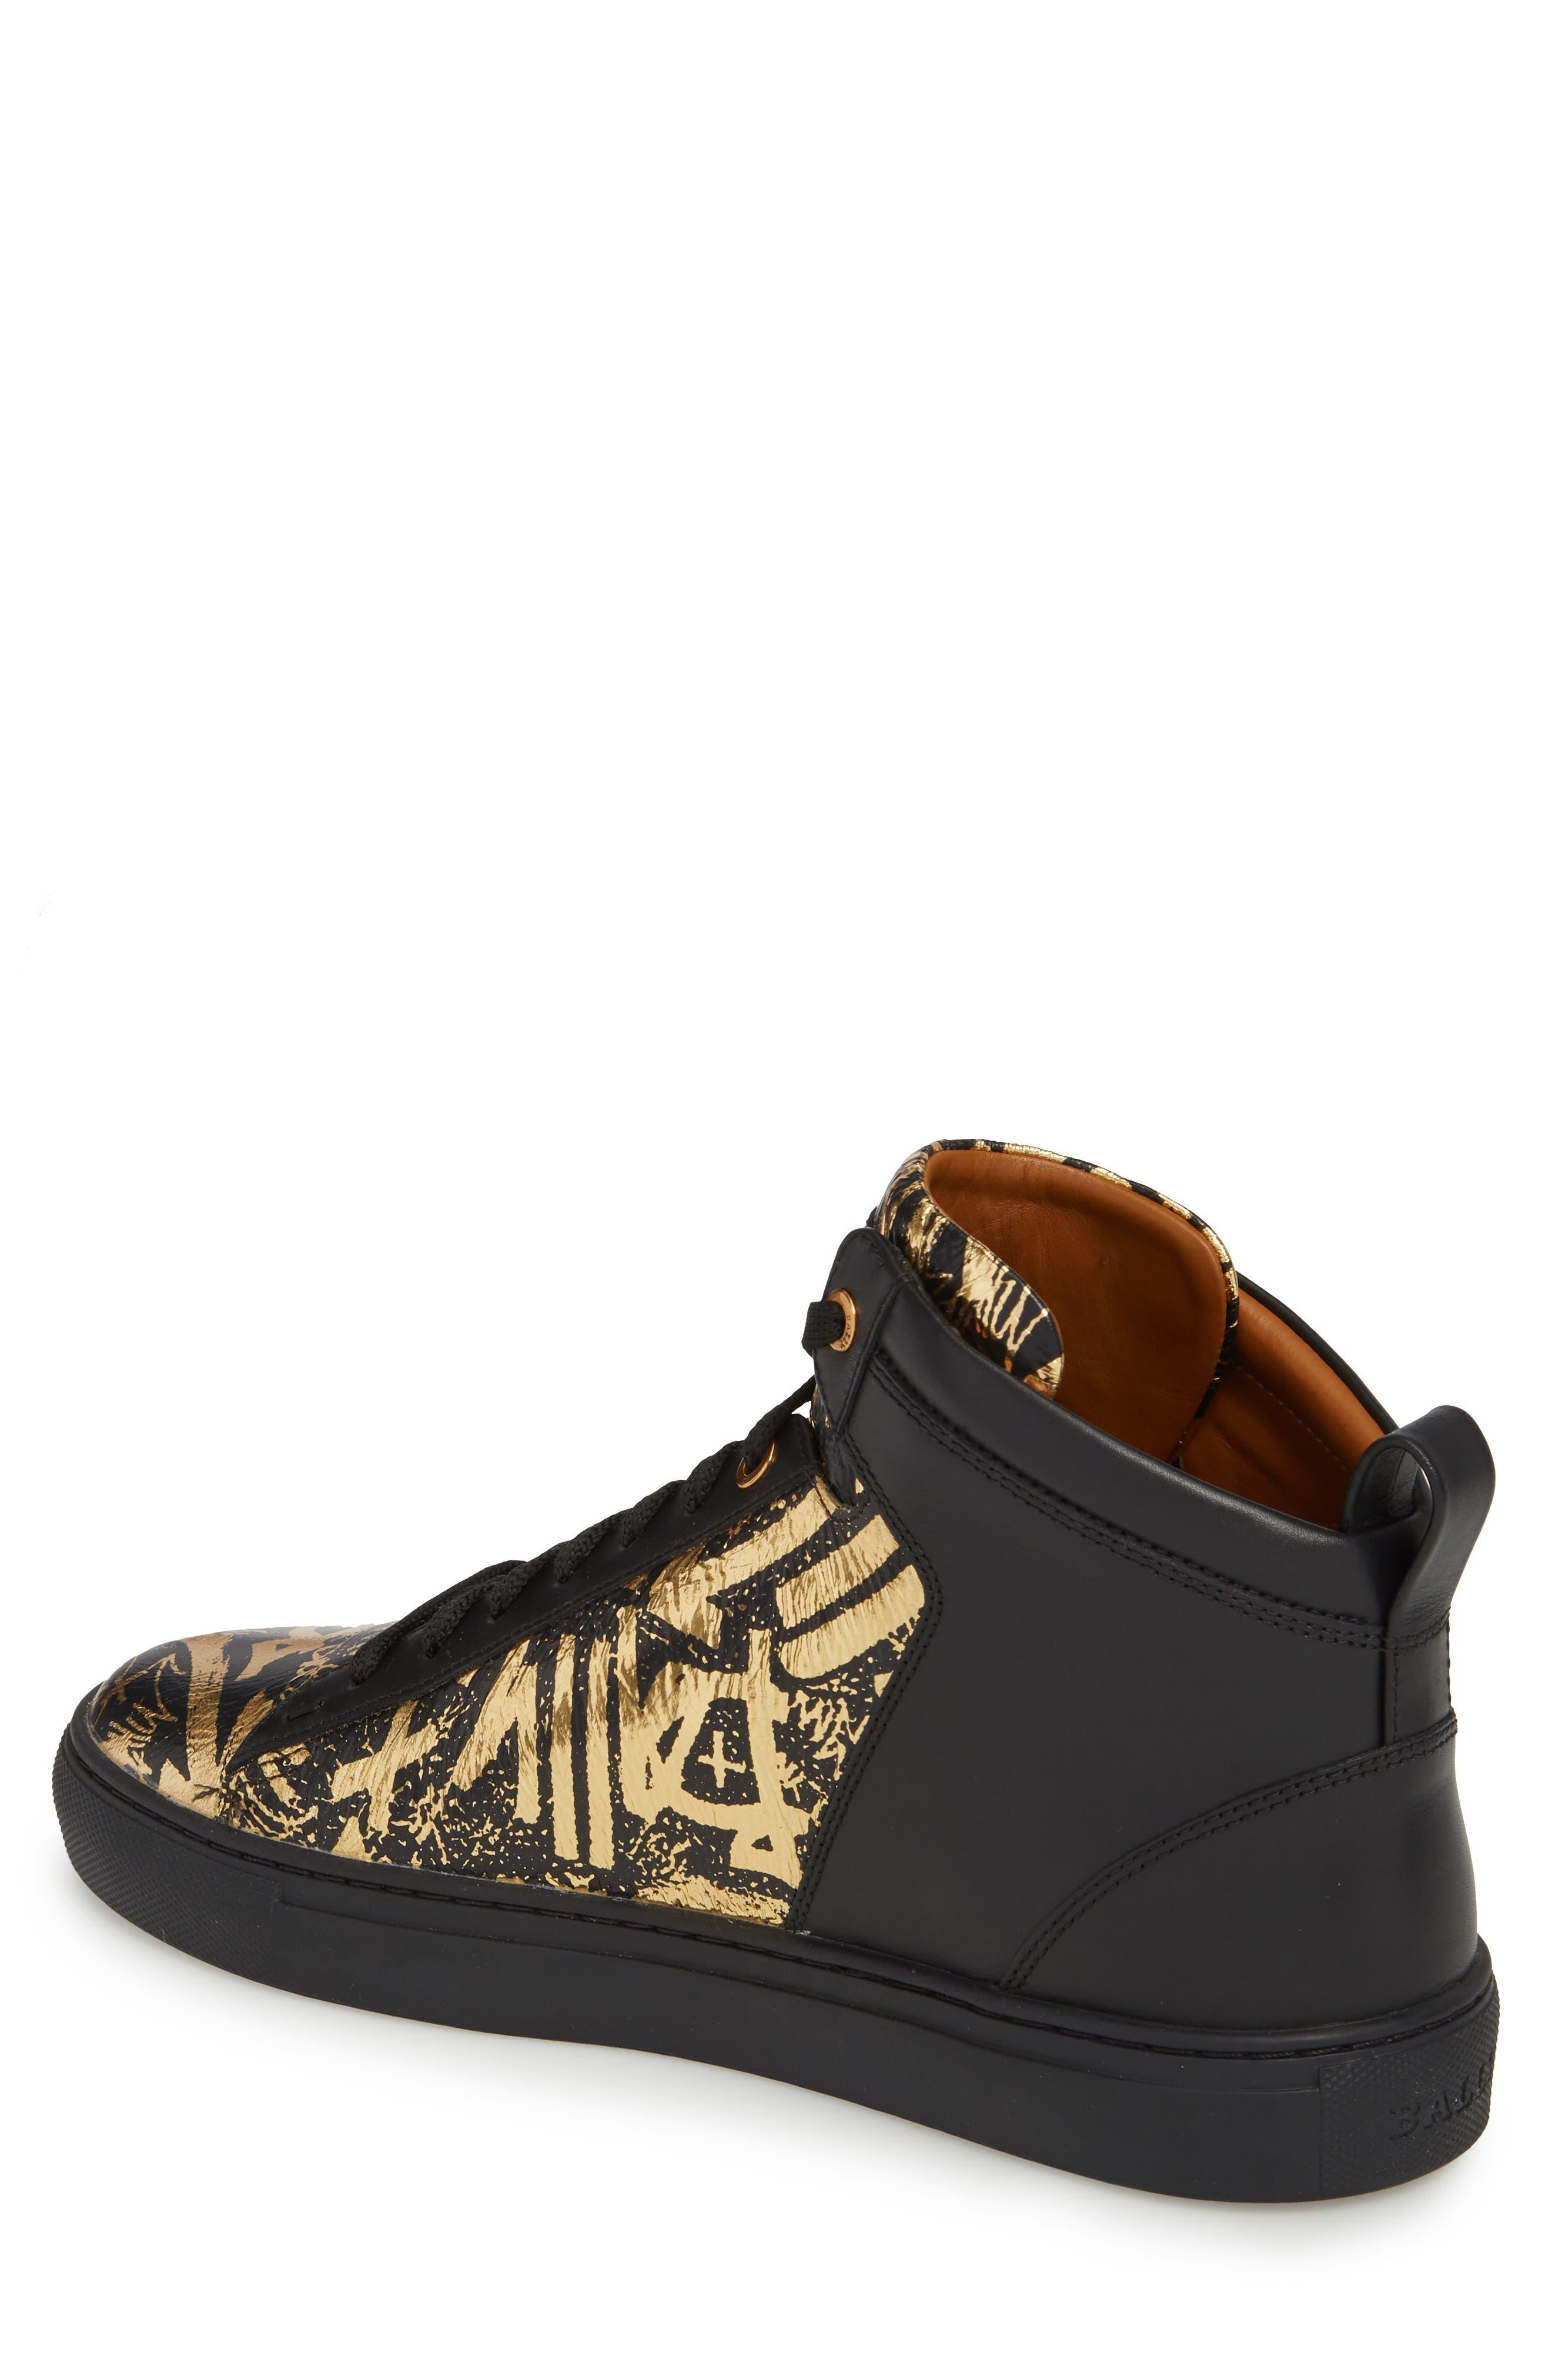 Hedo High Top Sneaker,                             Alternate thumbnail 2, color,                             GOLD